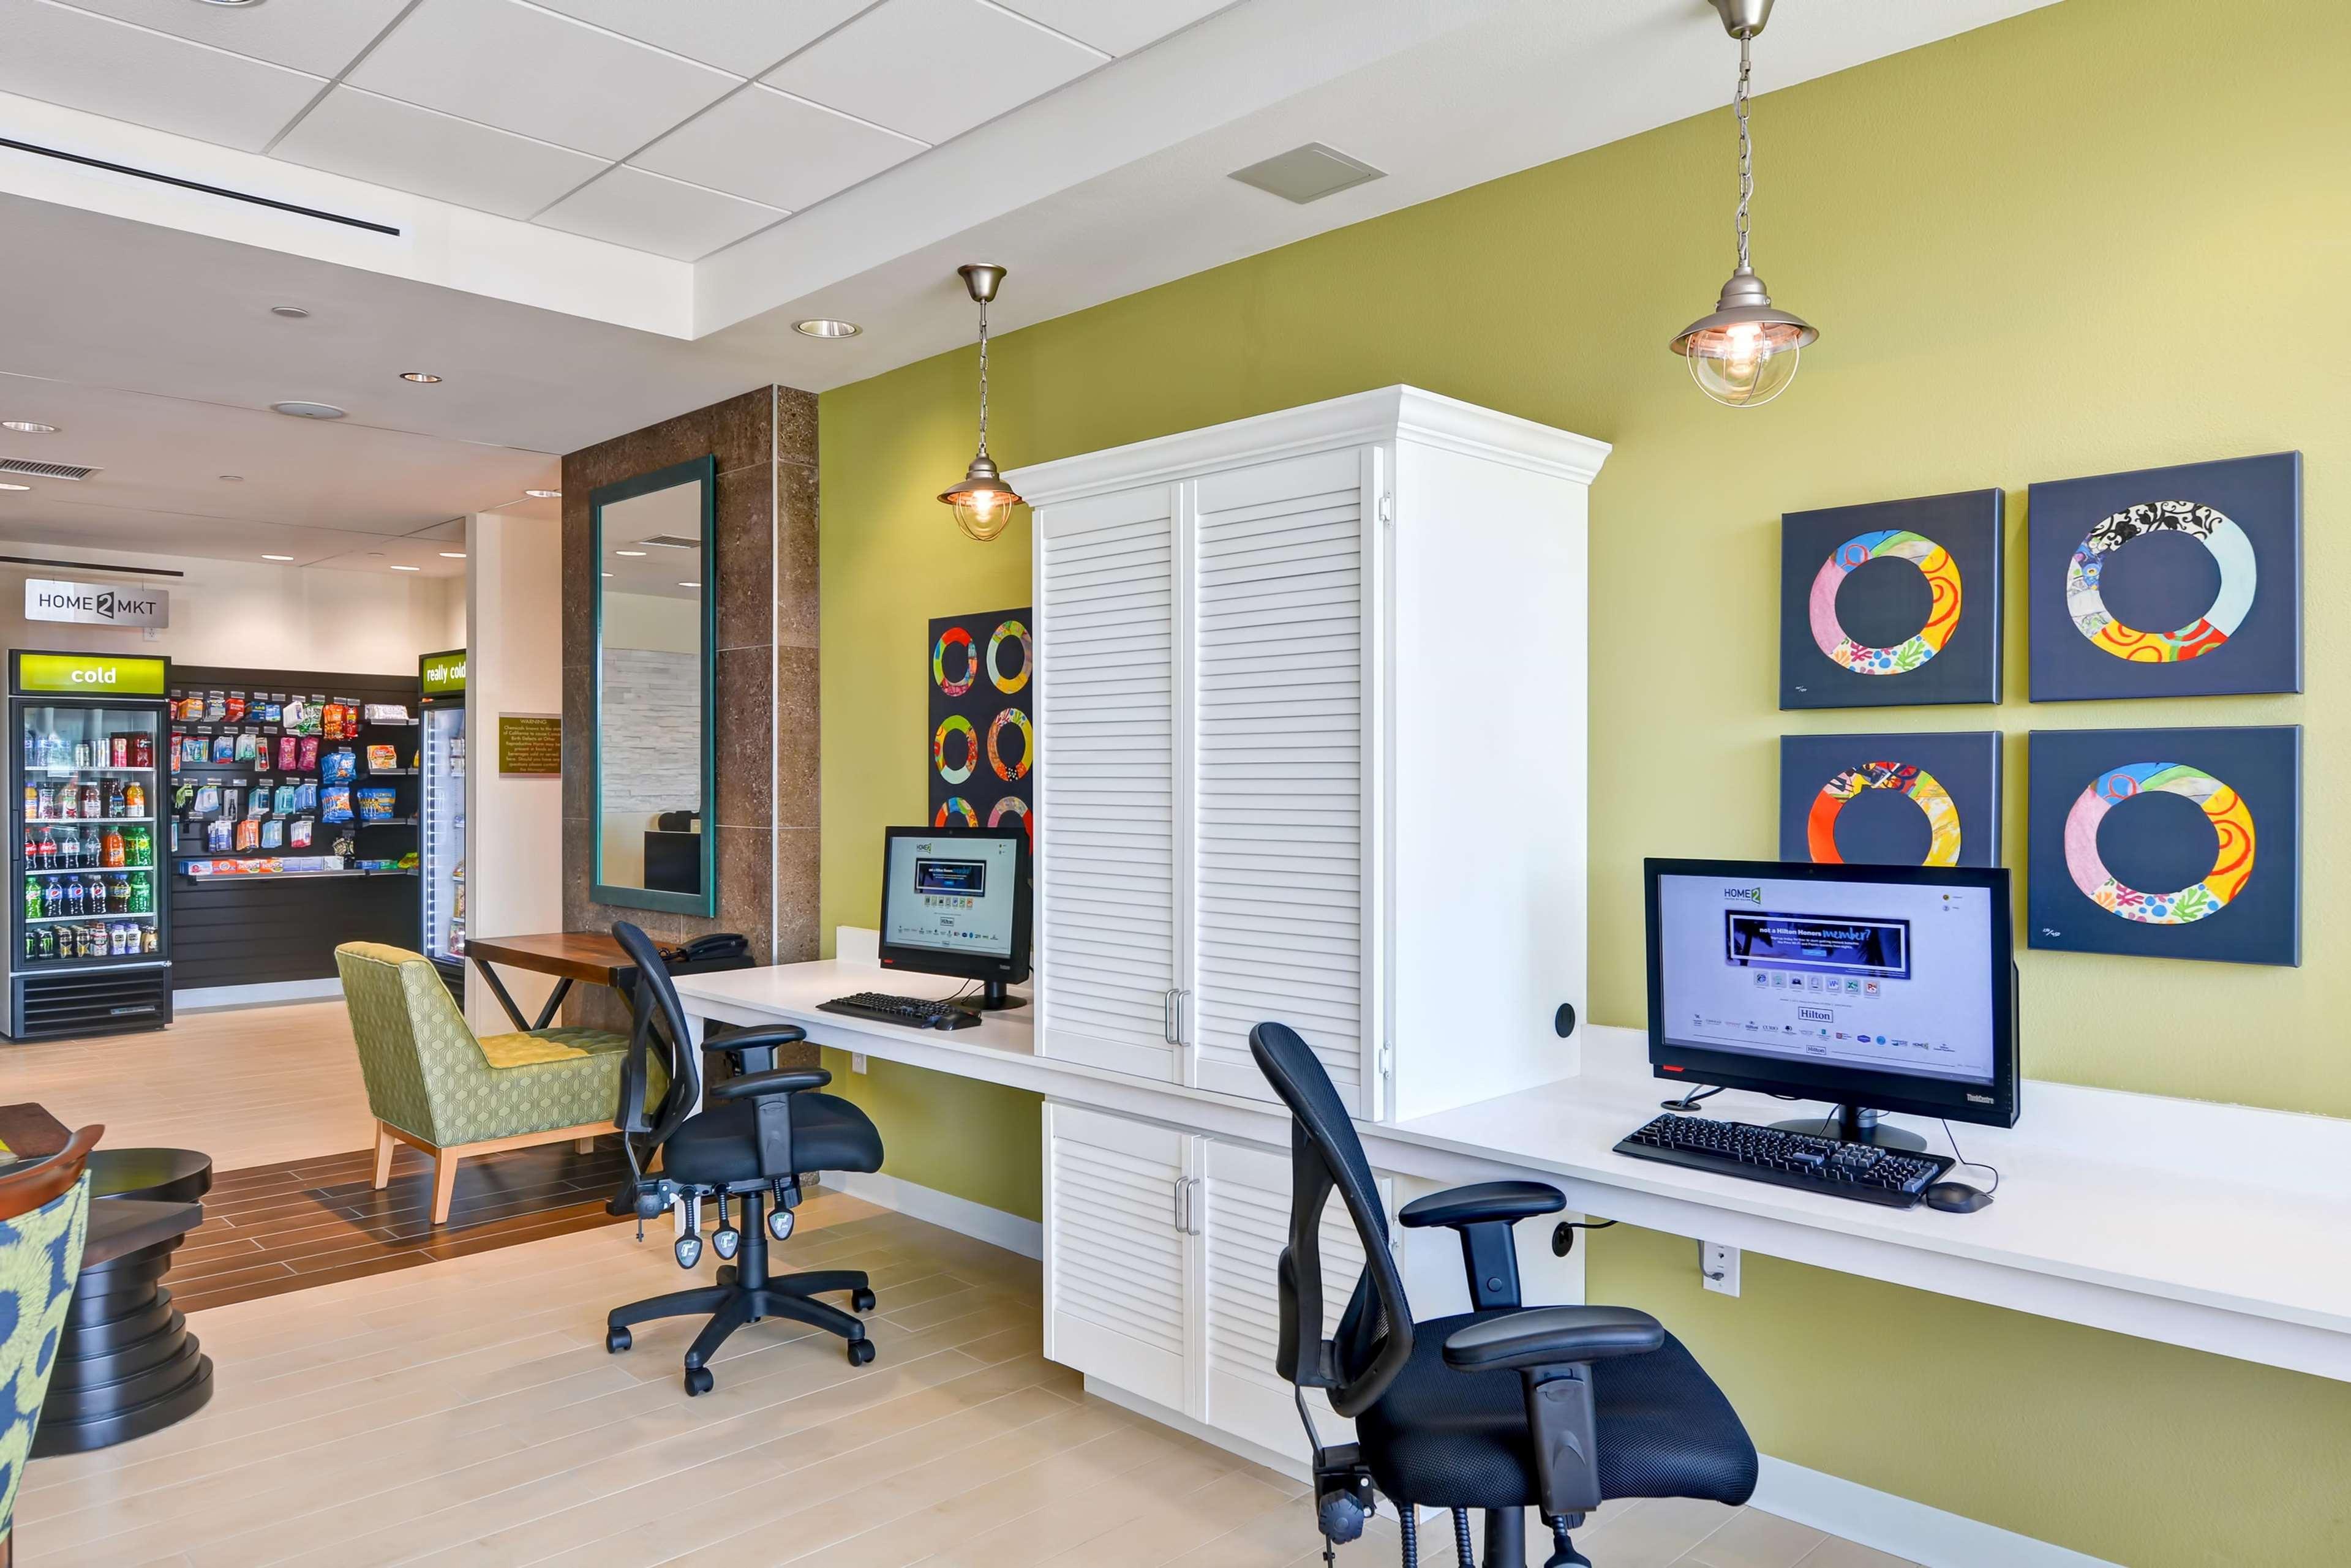 Home2 Suites by Hilton Azusa image 14